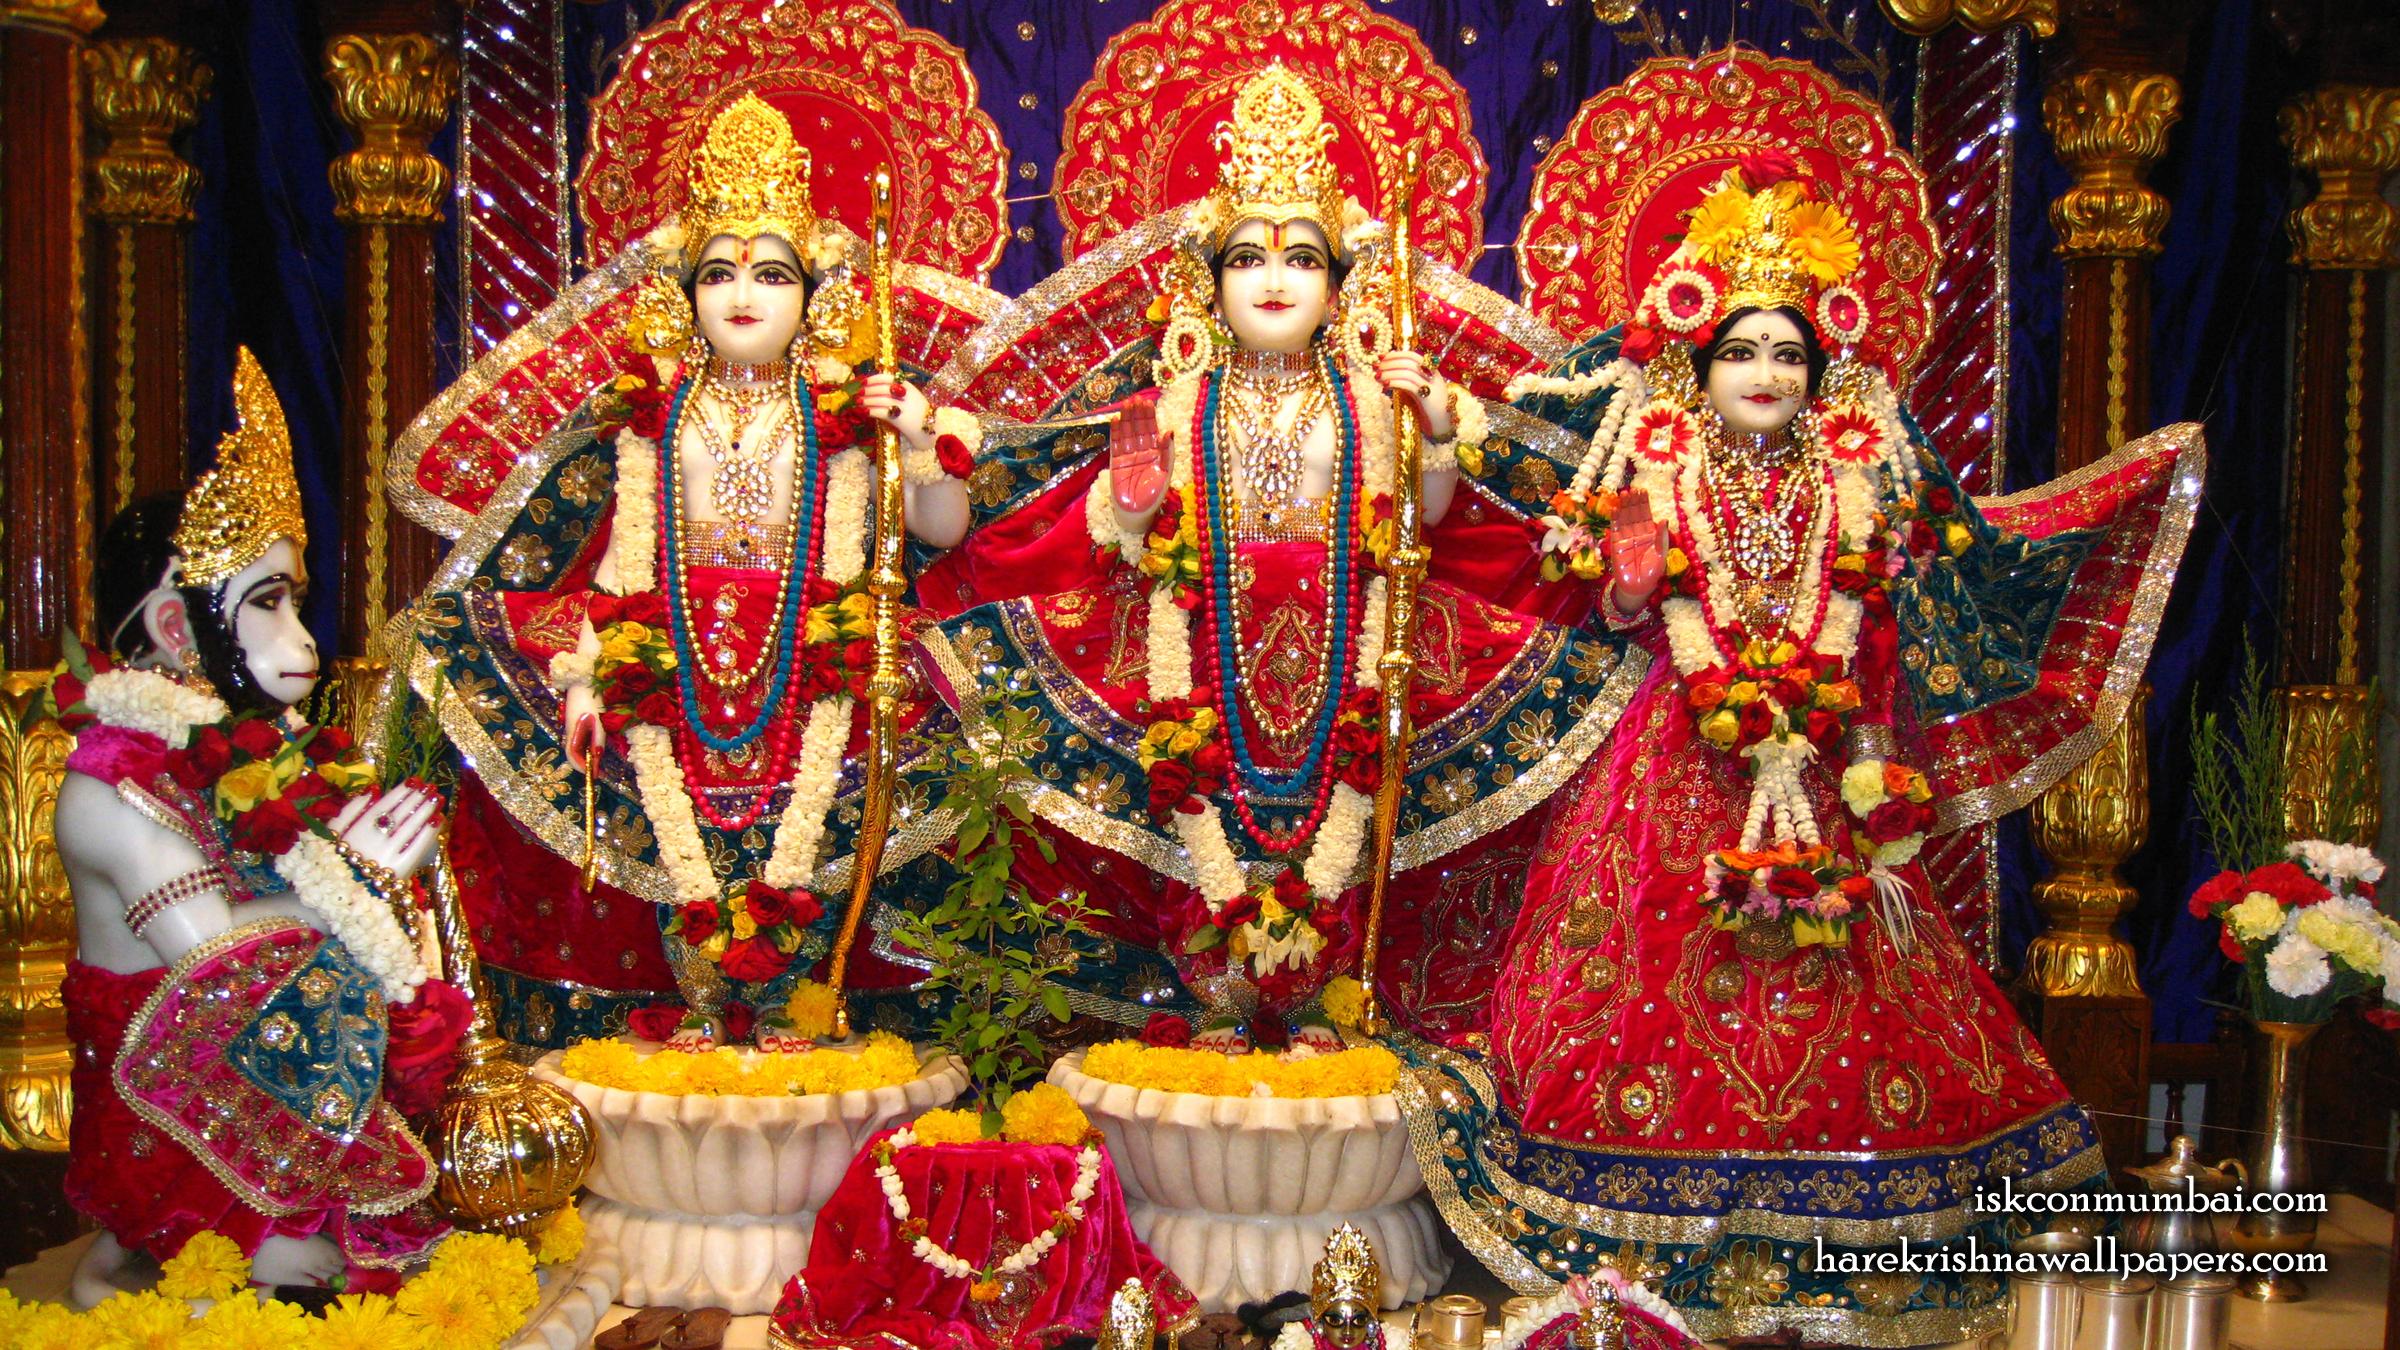 Sri Sri Sita Rama Laxman Hanuman Wallpaper (003) Size 2400x1350 Download